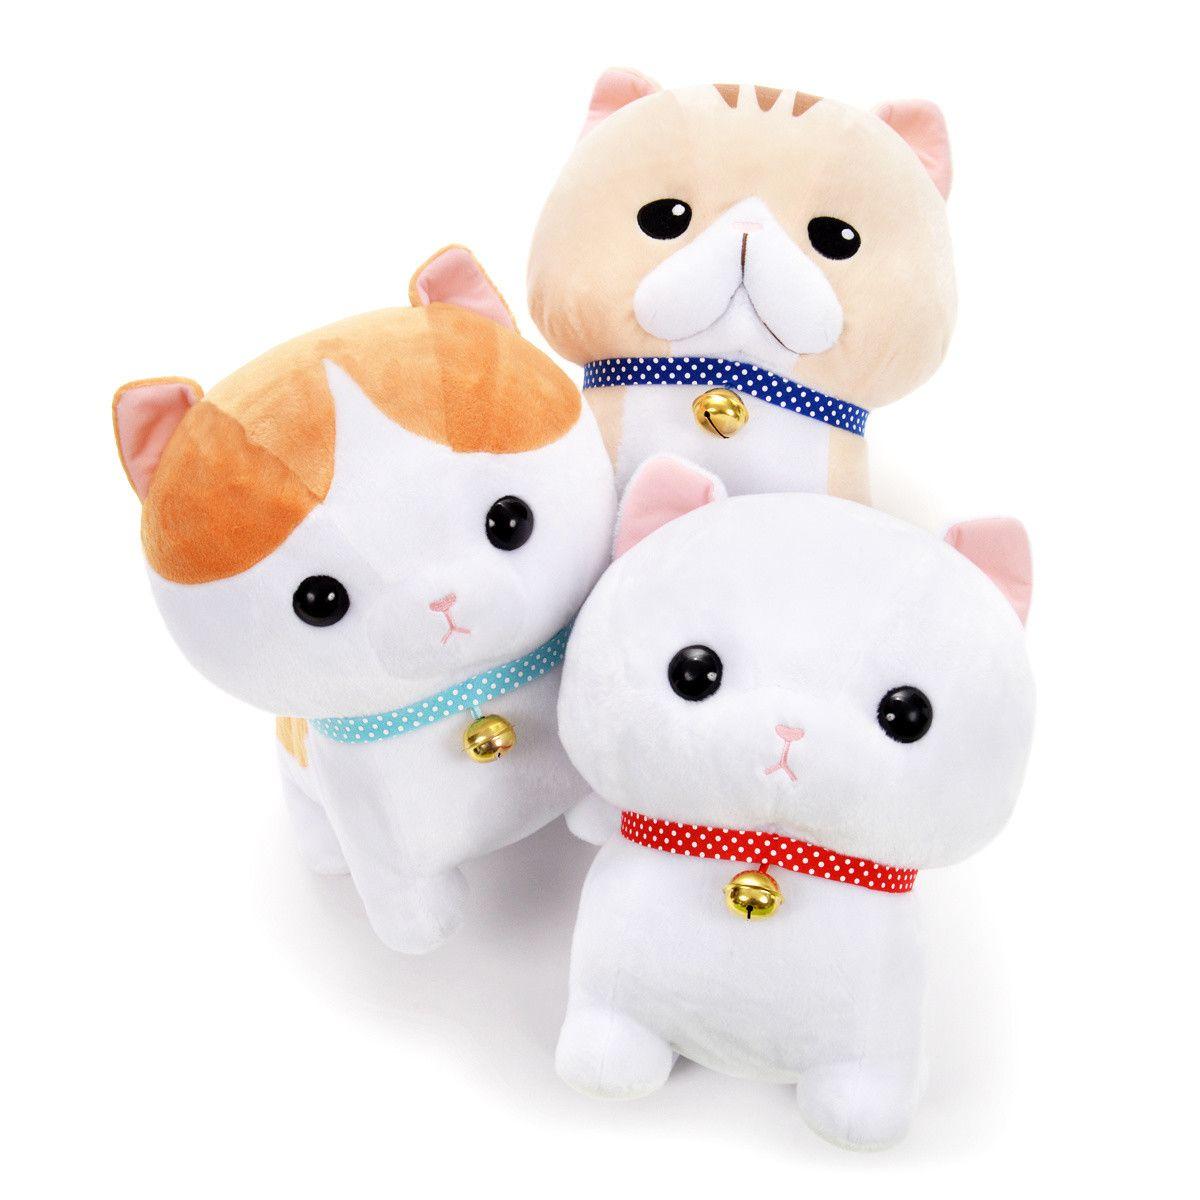 Hokkori Munchkin Cat Plush Collection Big Cat Plush Munchkin Cat Cute Stuffed Animals